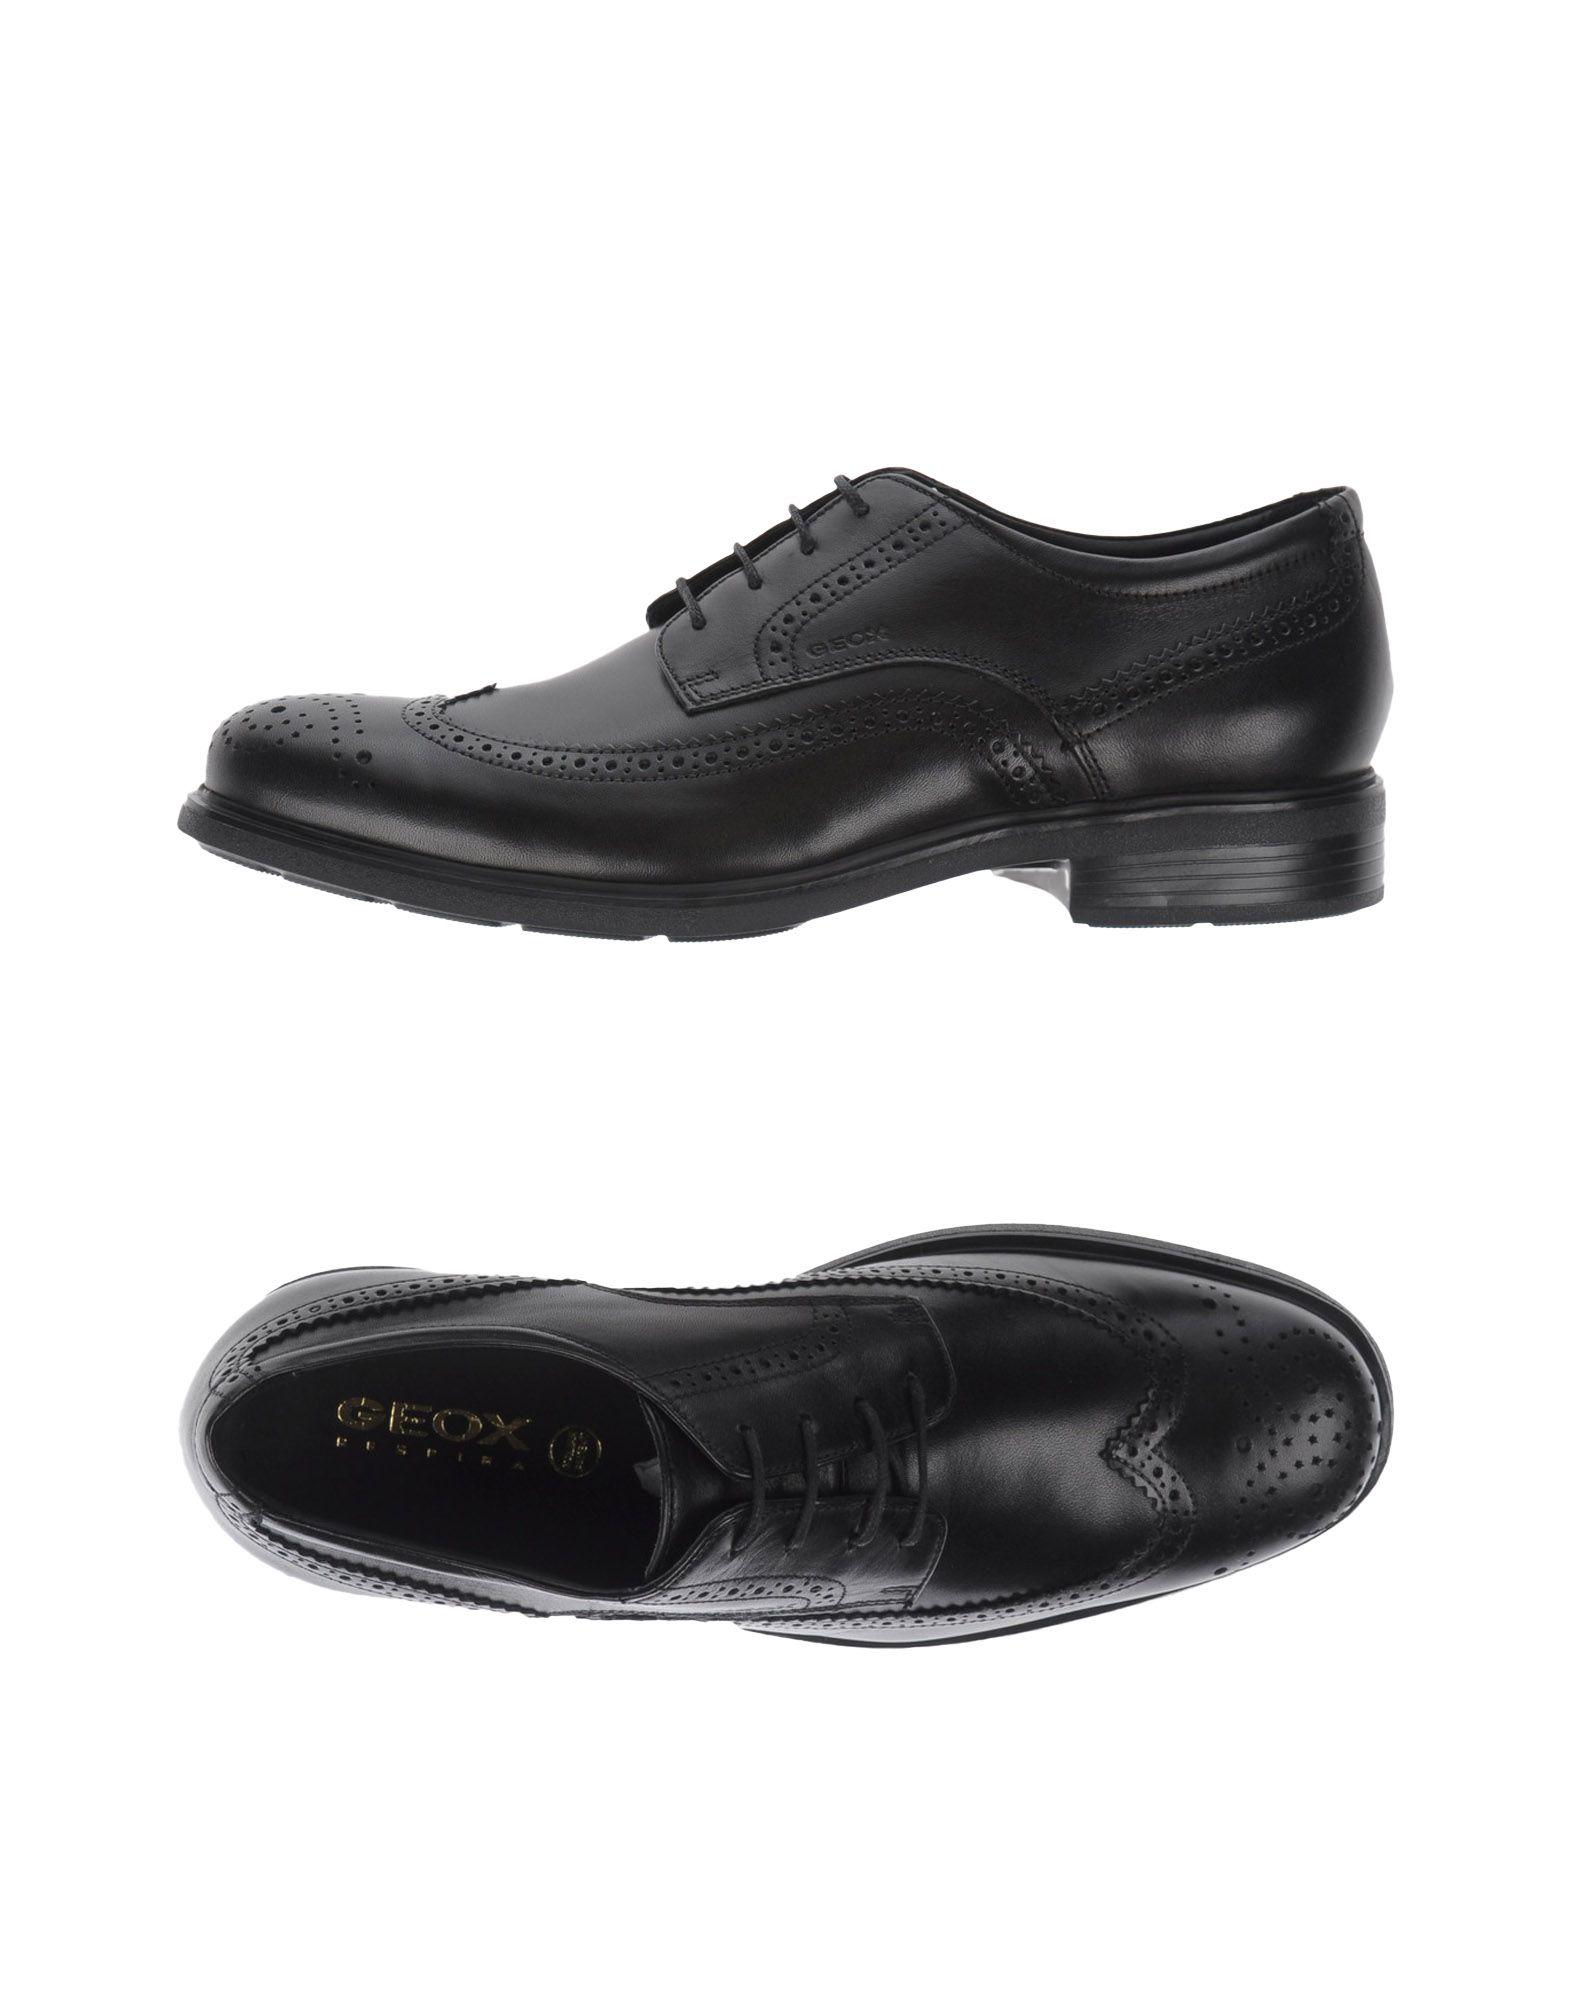 Rabatt echte Schuhe Geox Schnürschuhe Herren  11086053OH